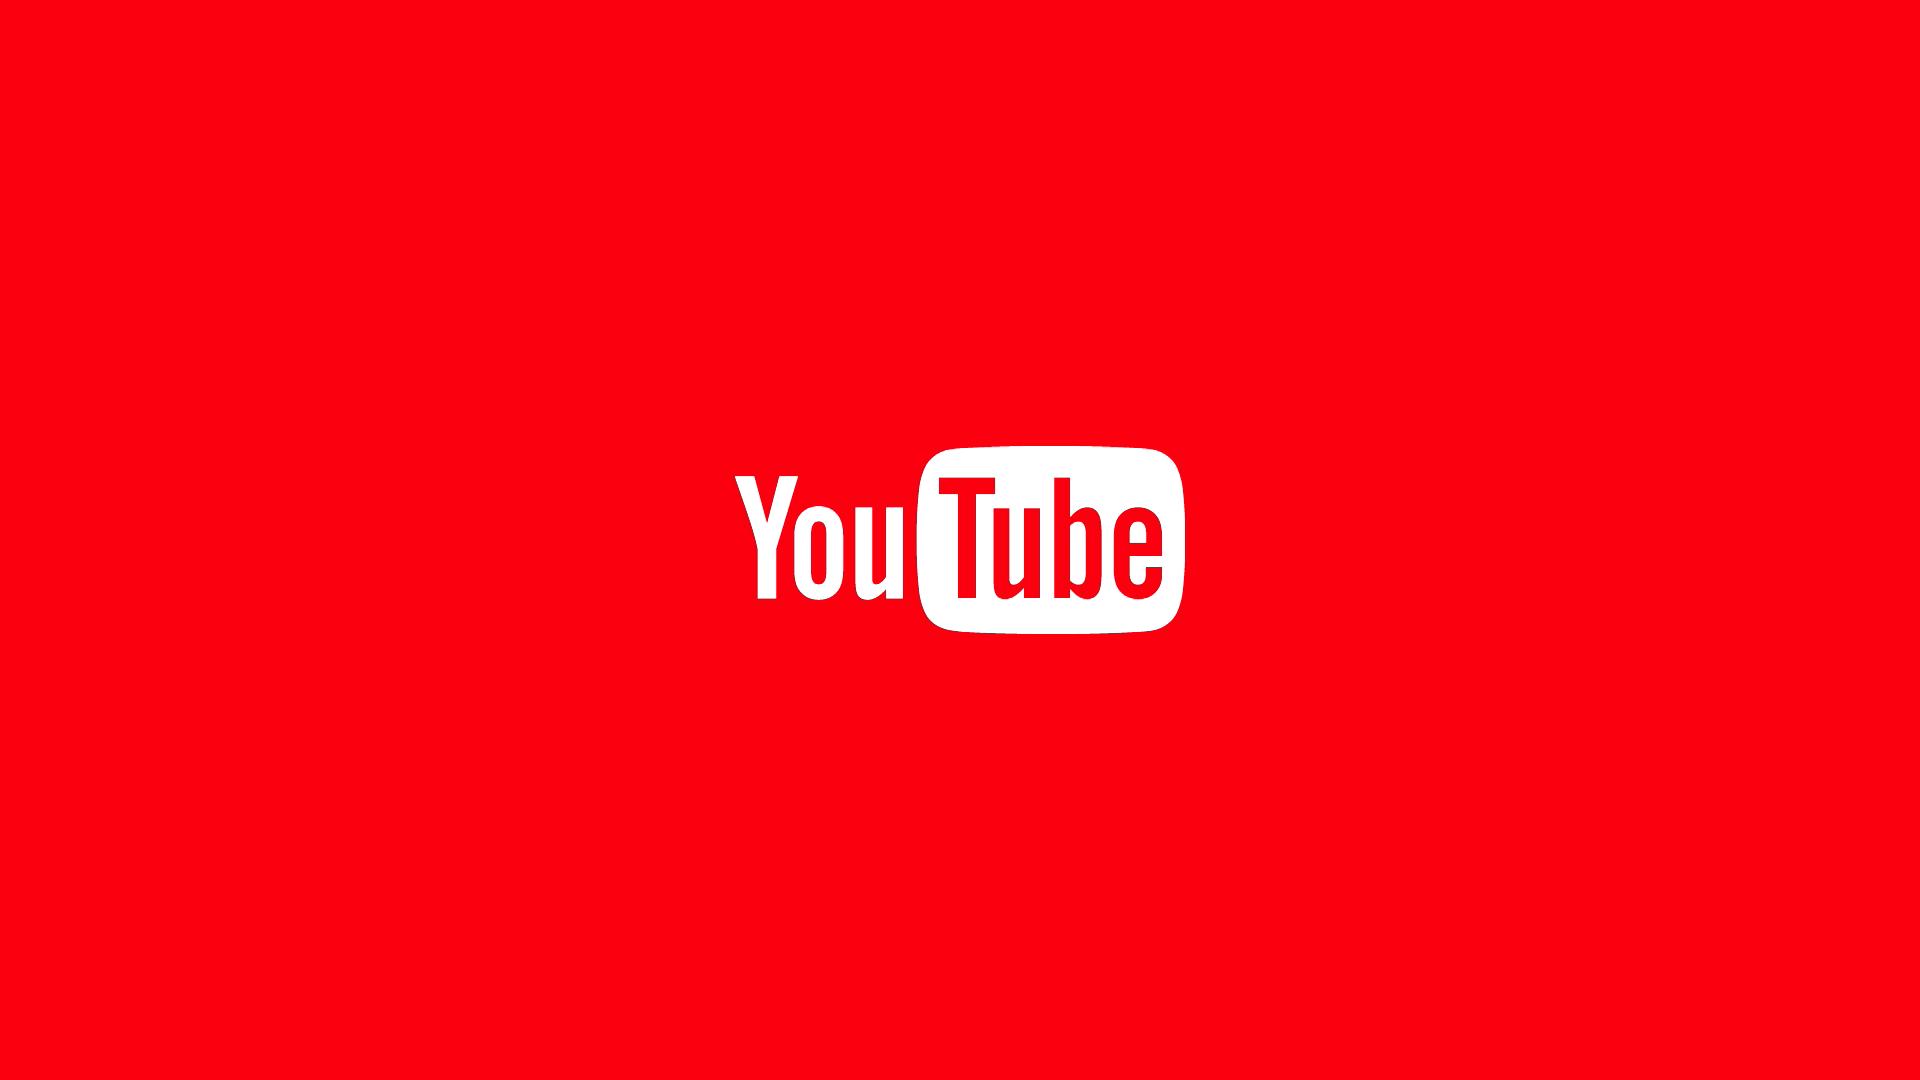 Youtube Logo Hd Wallpapers Youtube Logo Youtube Subscribers Youtube